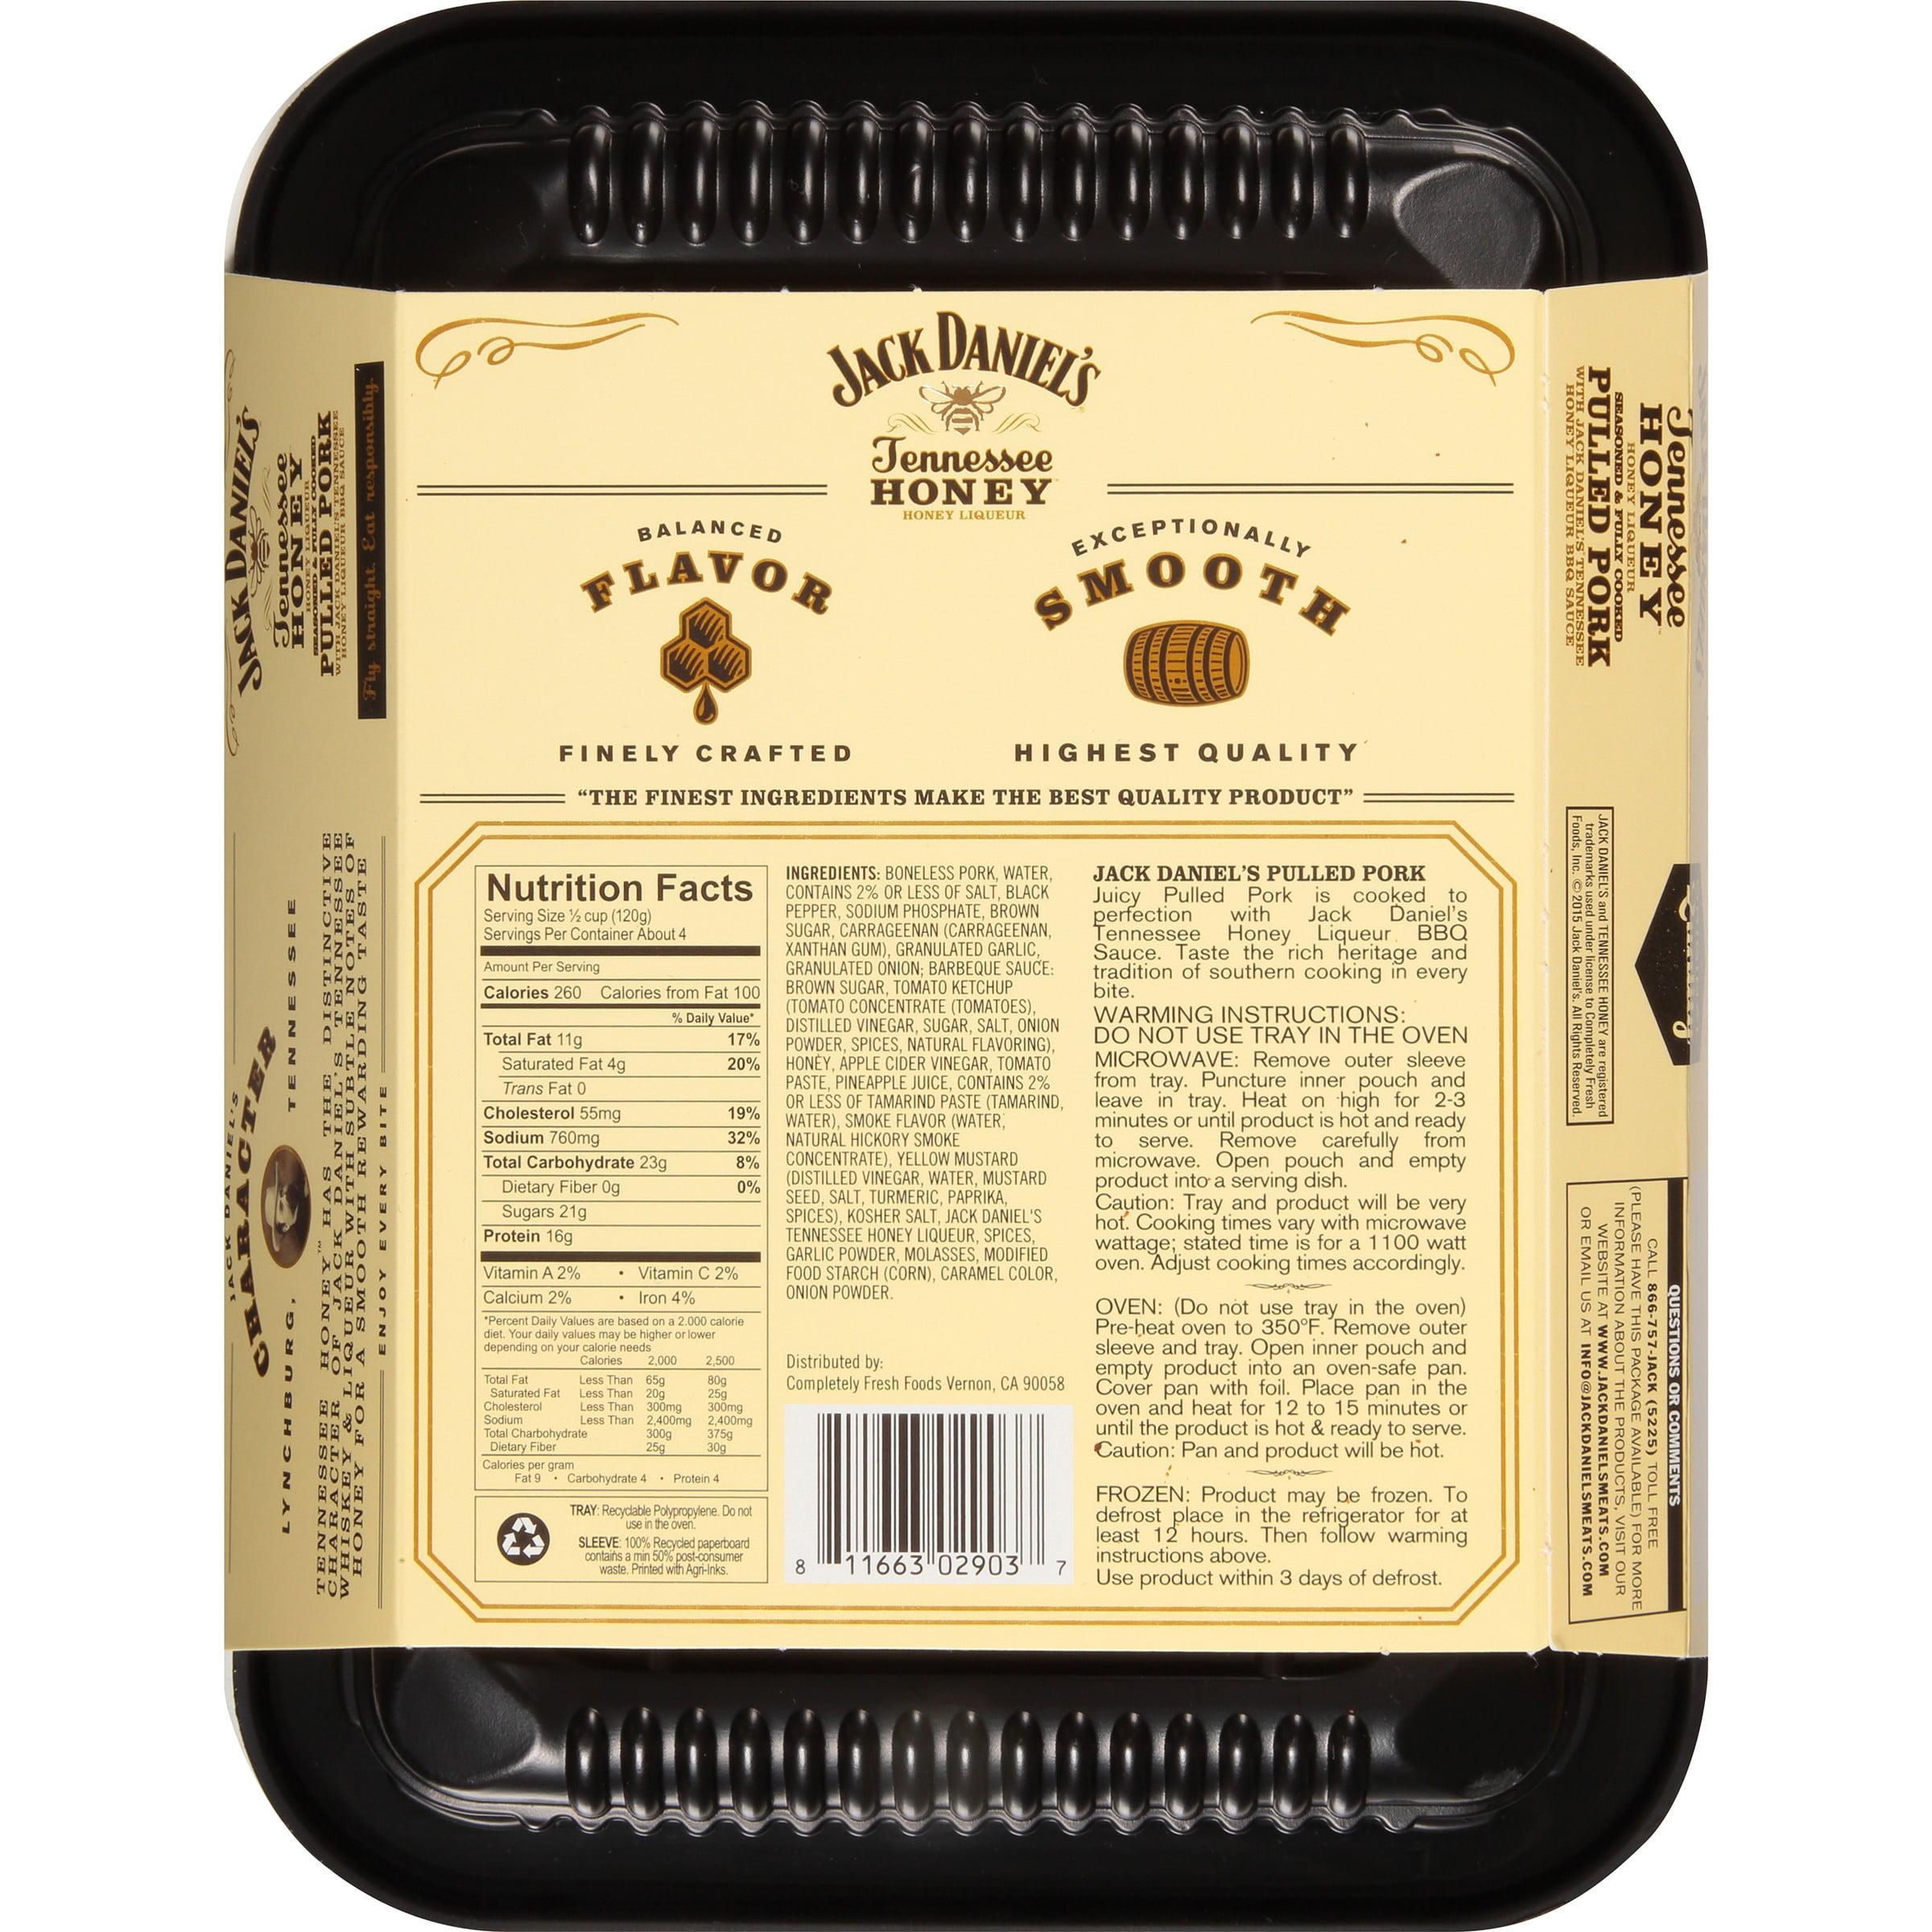 Jack Daniel's Honey Pulled Pork, 16 oz